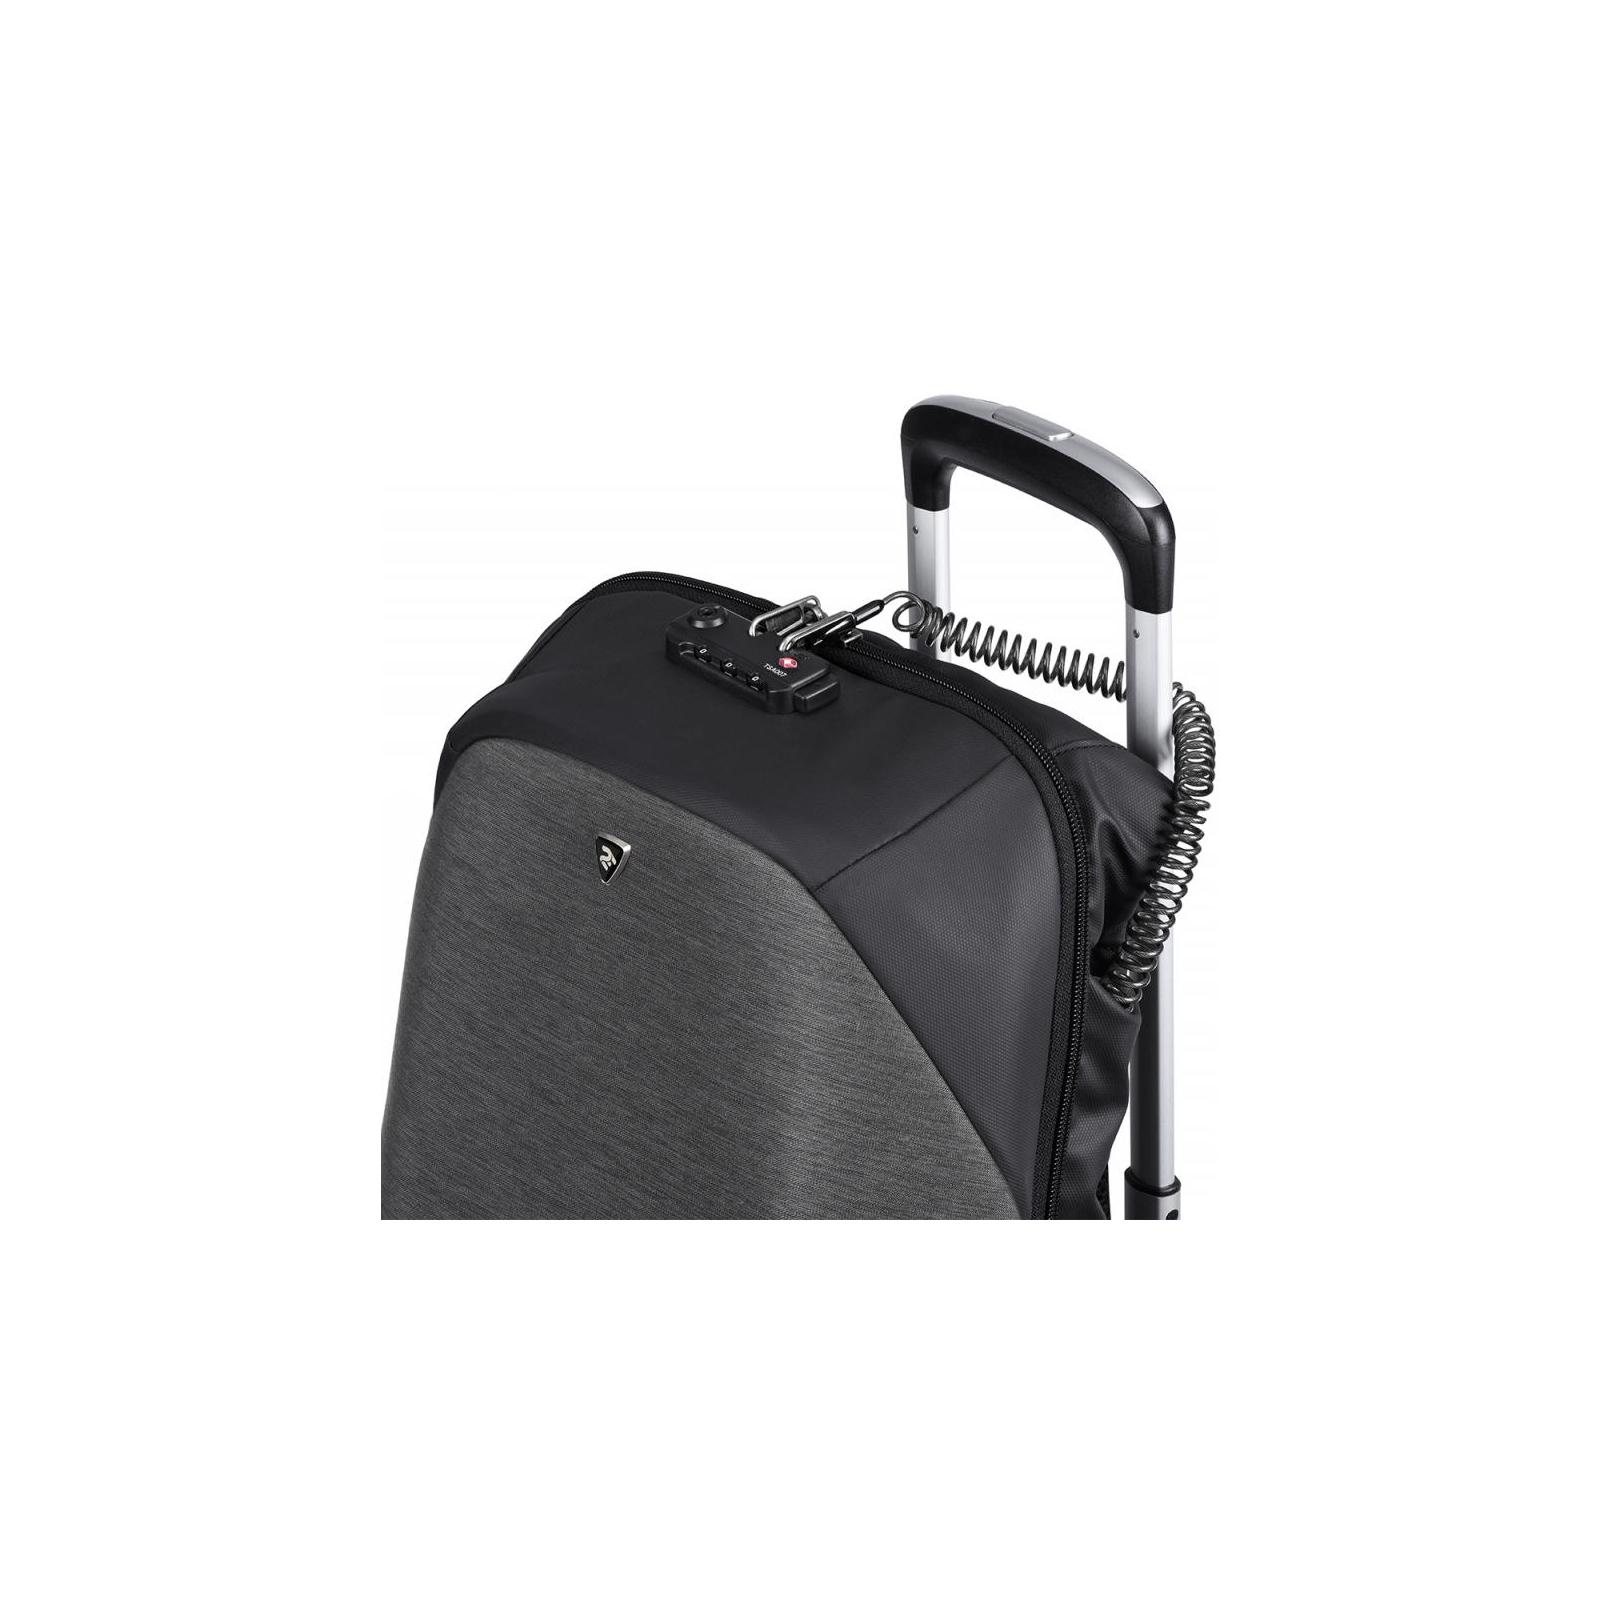 "Рюкзак для ноутбука 2E 16"" BPK63148 Black (2E-BPK63148BK) изображение 8"